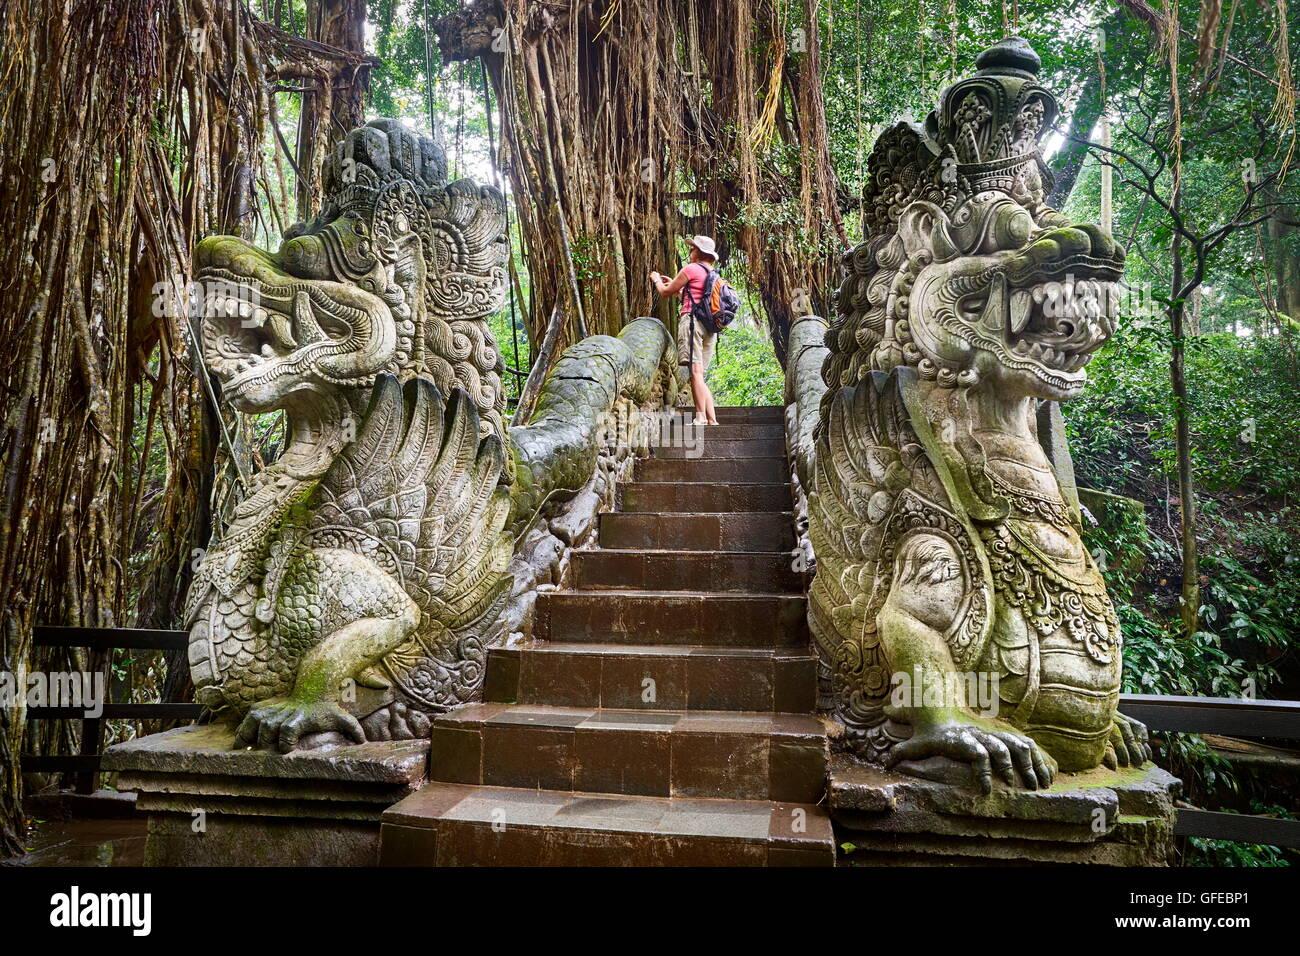 bosque hindu single men With its open-plan spaces and large spans of glazing that offer impressive views of the surrounding lush nature, we'd place la casa en el bosque am.